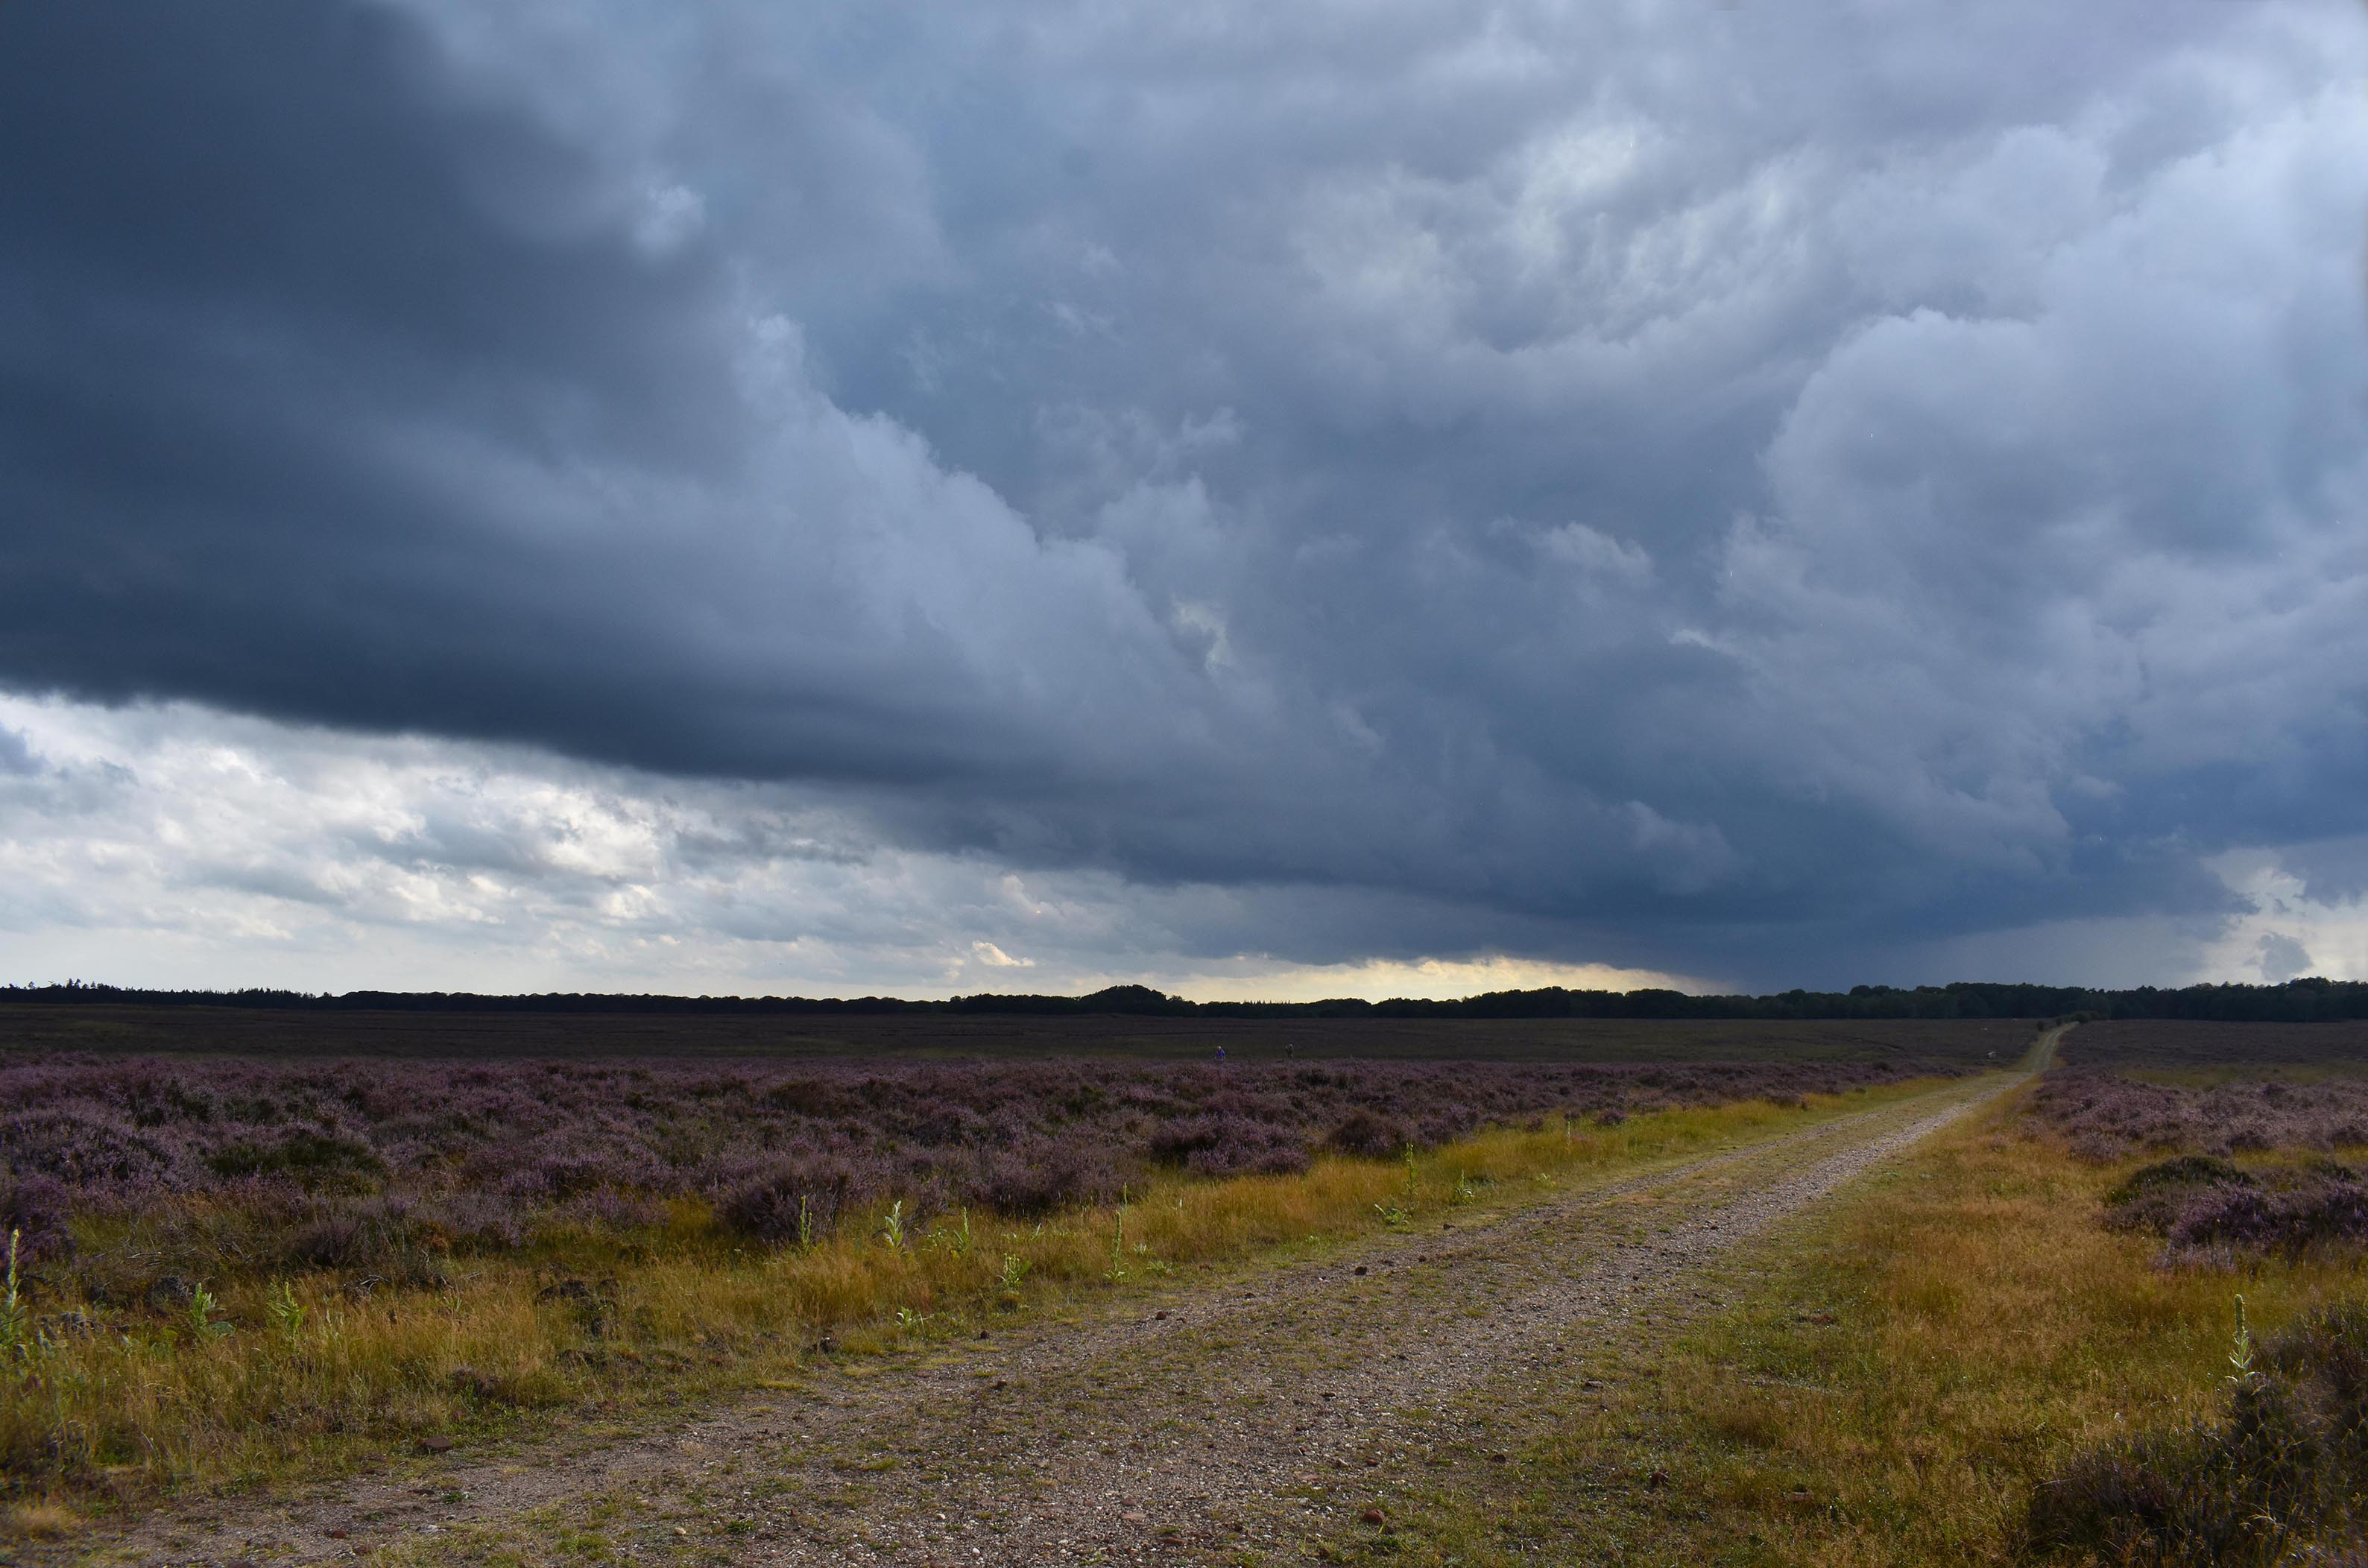 Donkere wolkenlucht boven de bloeiende heide van het Oud Reemster Veld op de Hoge Veluwe - Foto: ©Louis Fraanje